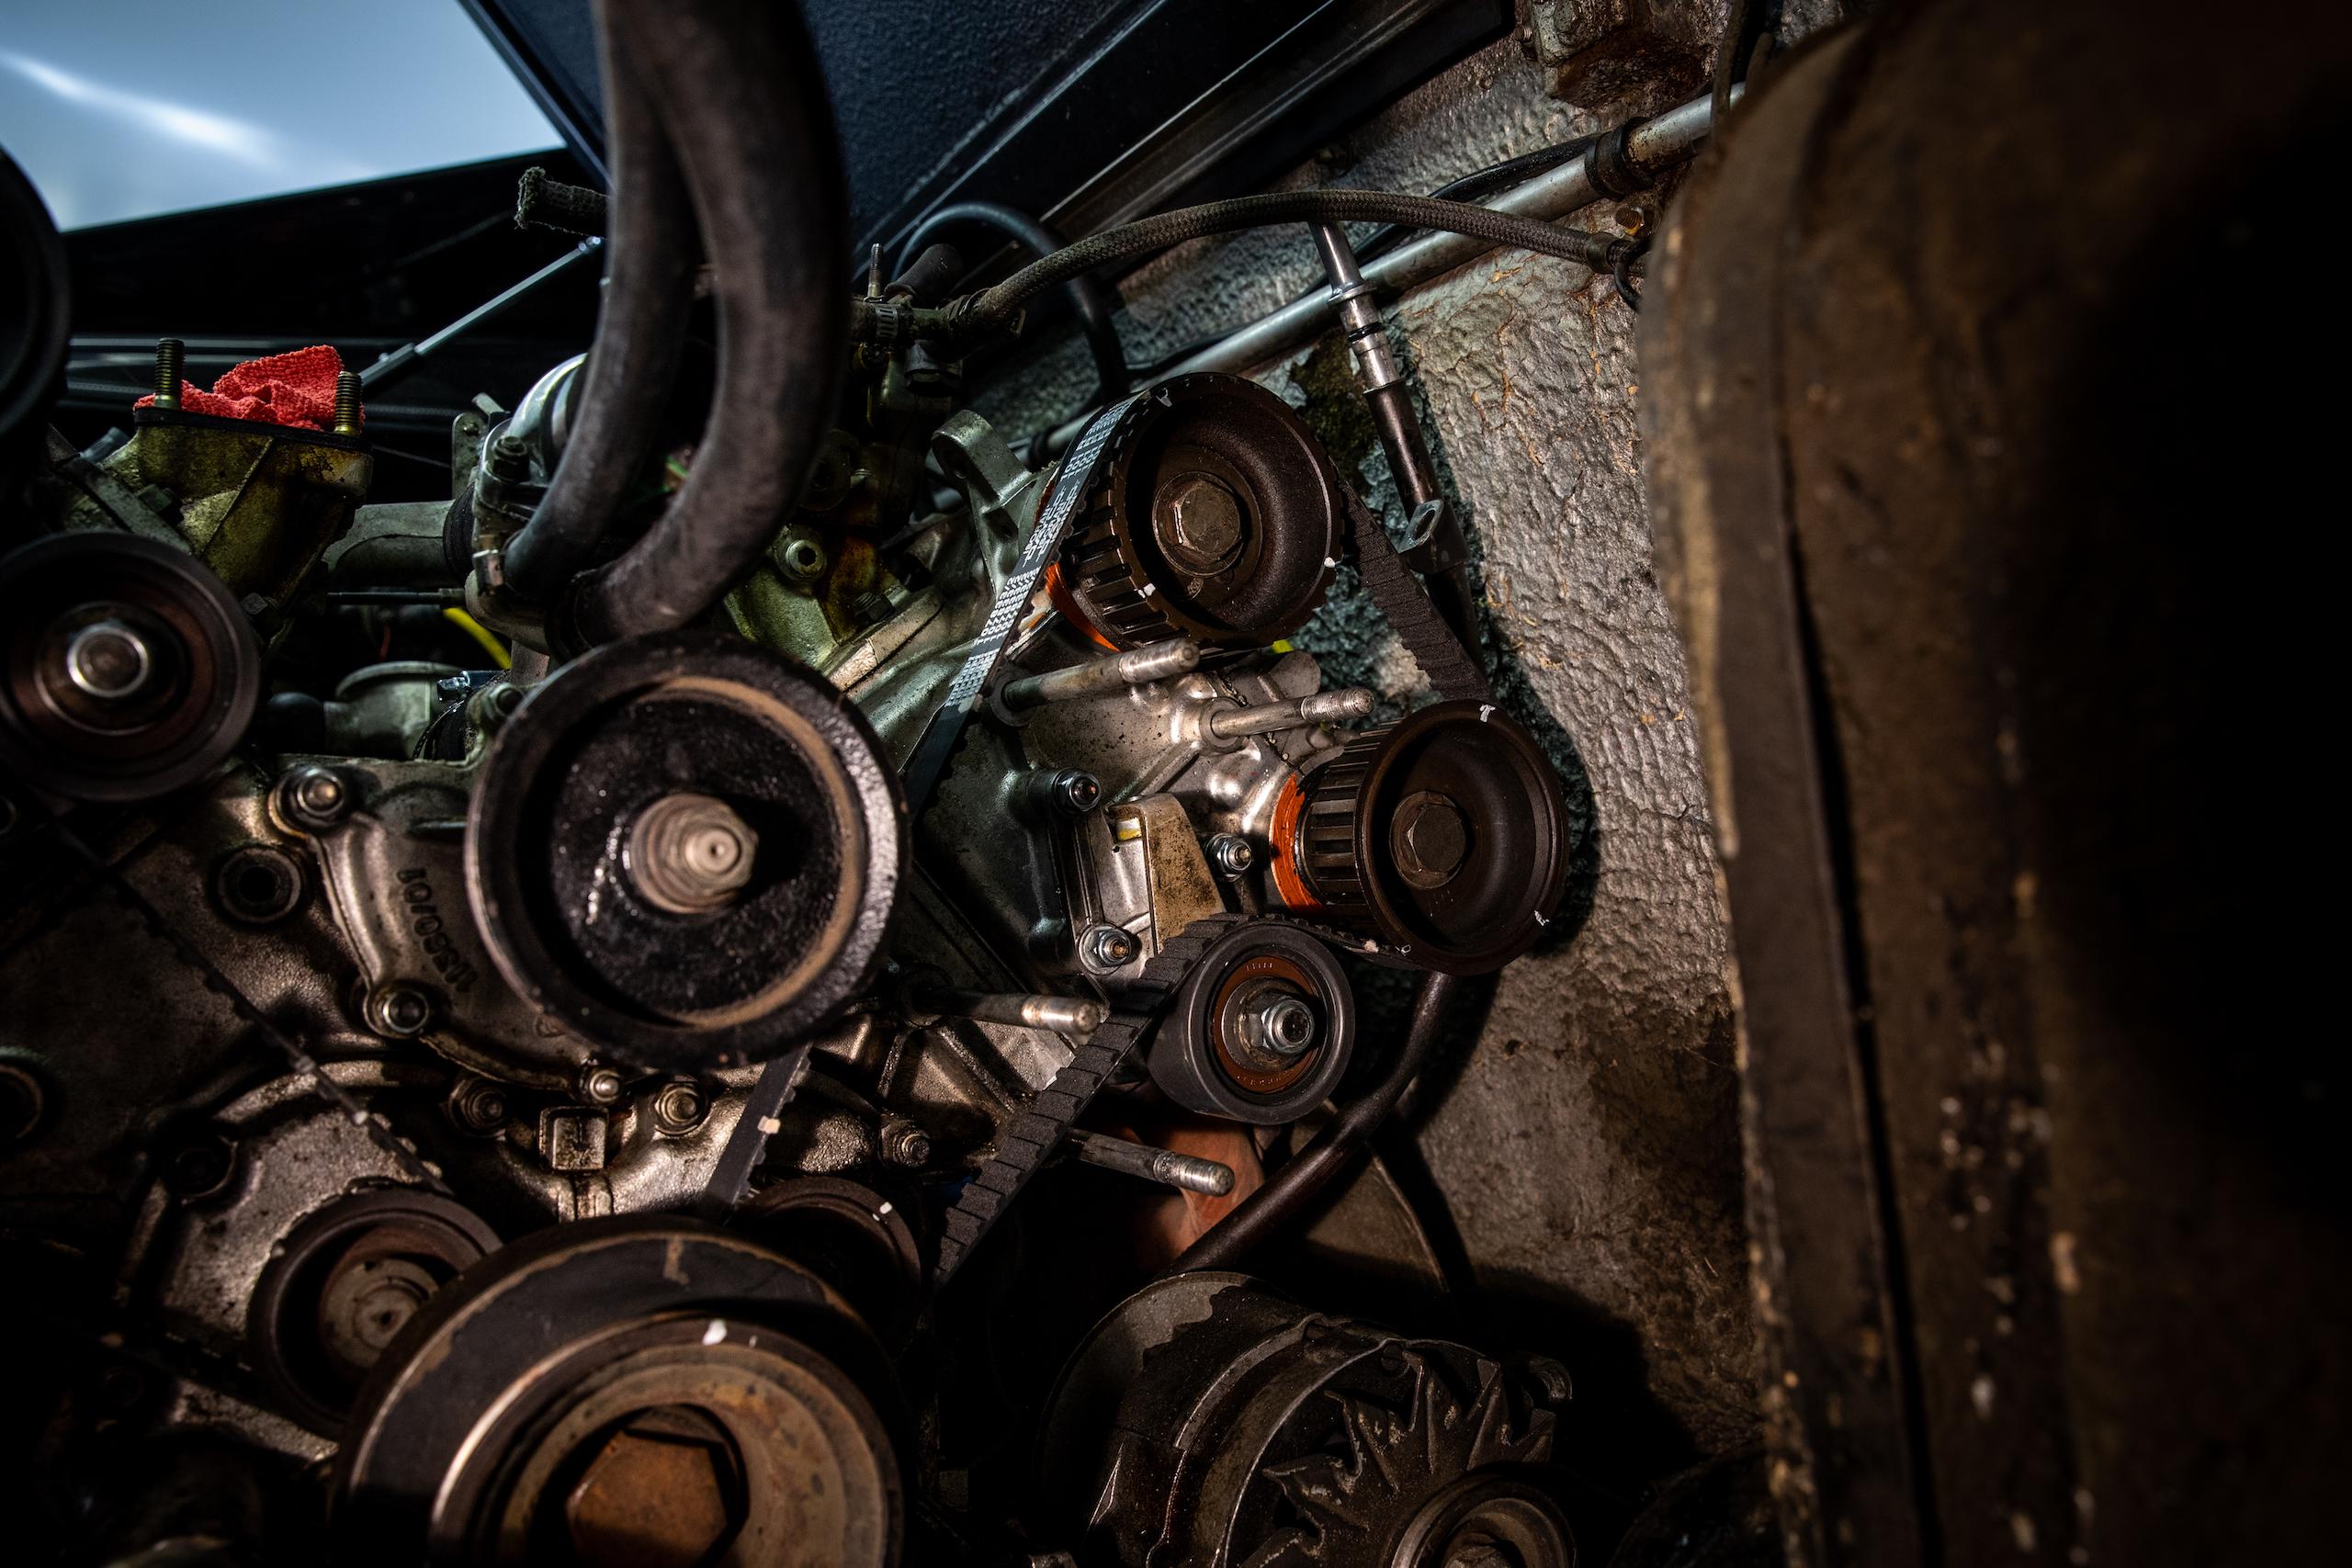 Ferrari Dino engine close